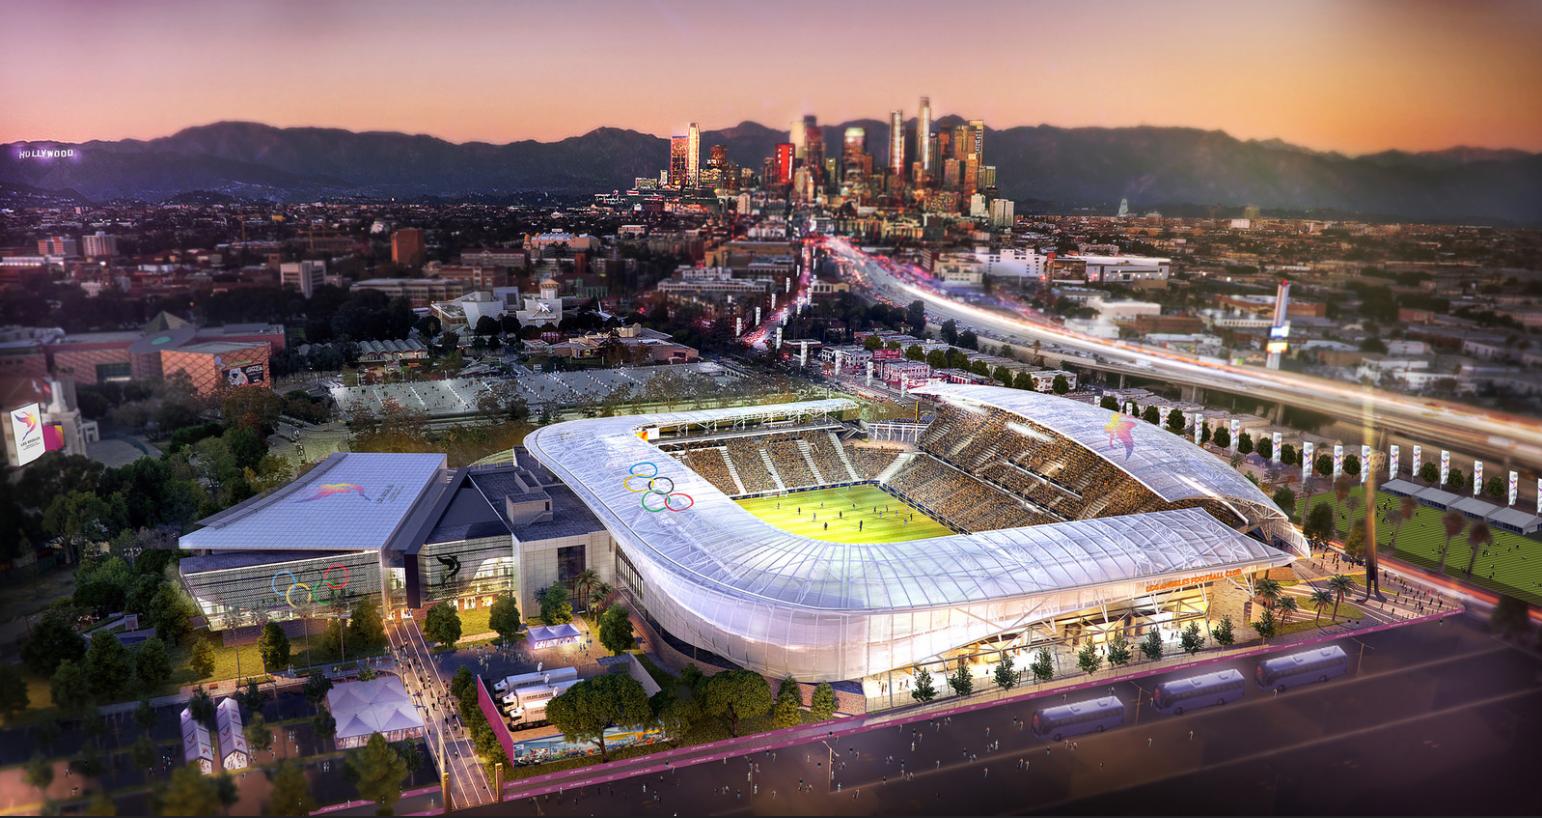 LA 2024 Olympic and Paralympic Bid Process - LA 2024 Soccer Stadium Rendering